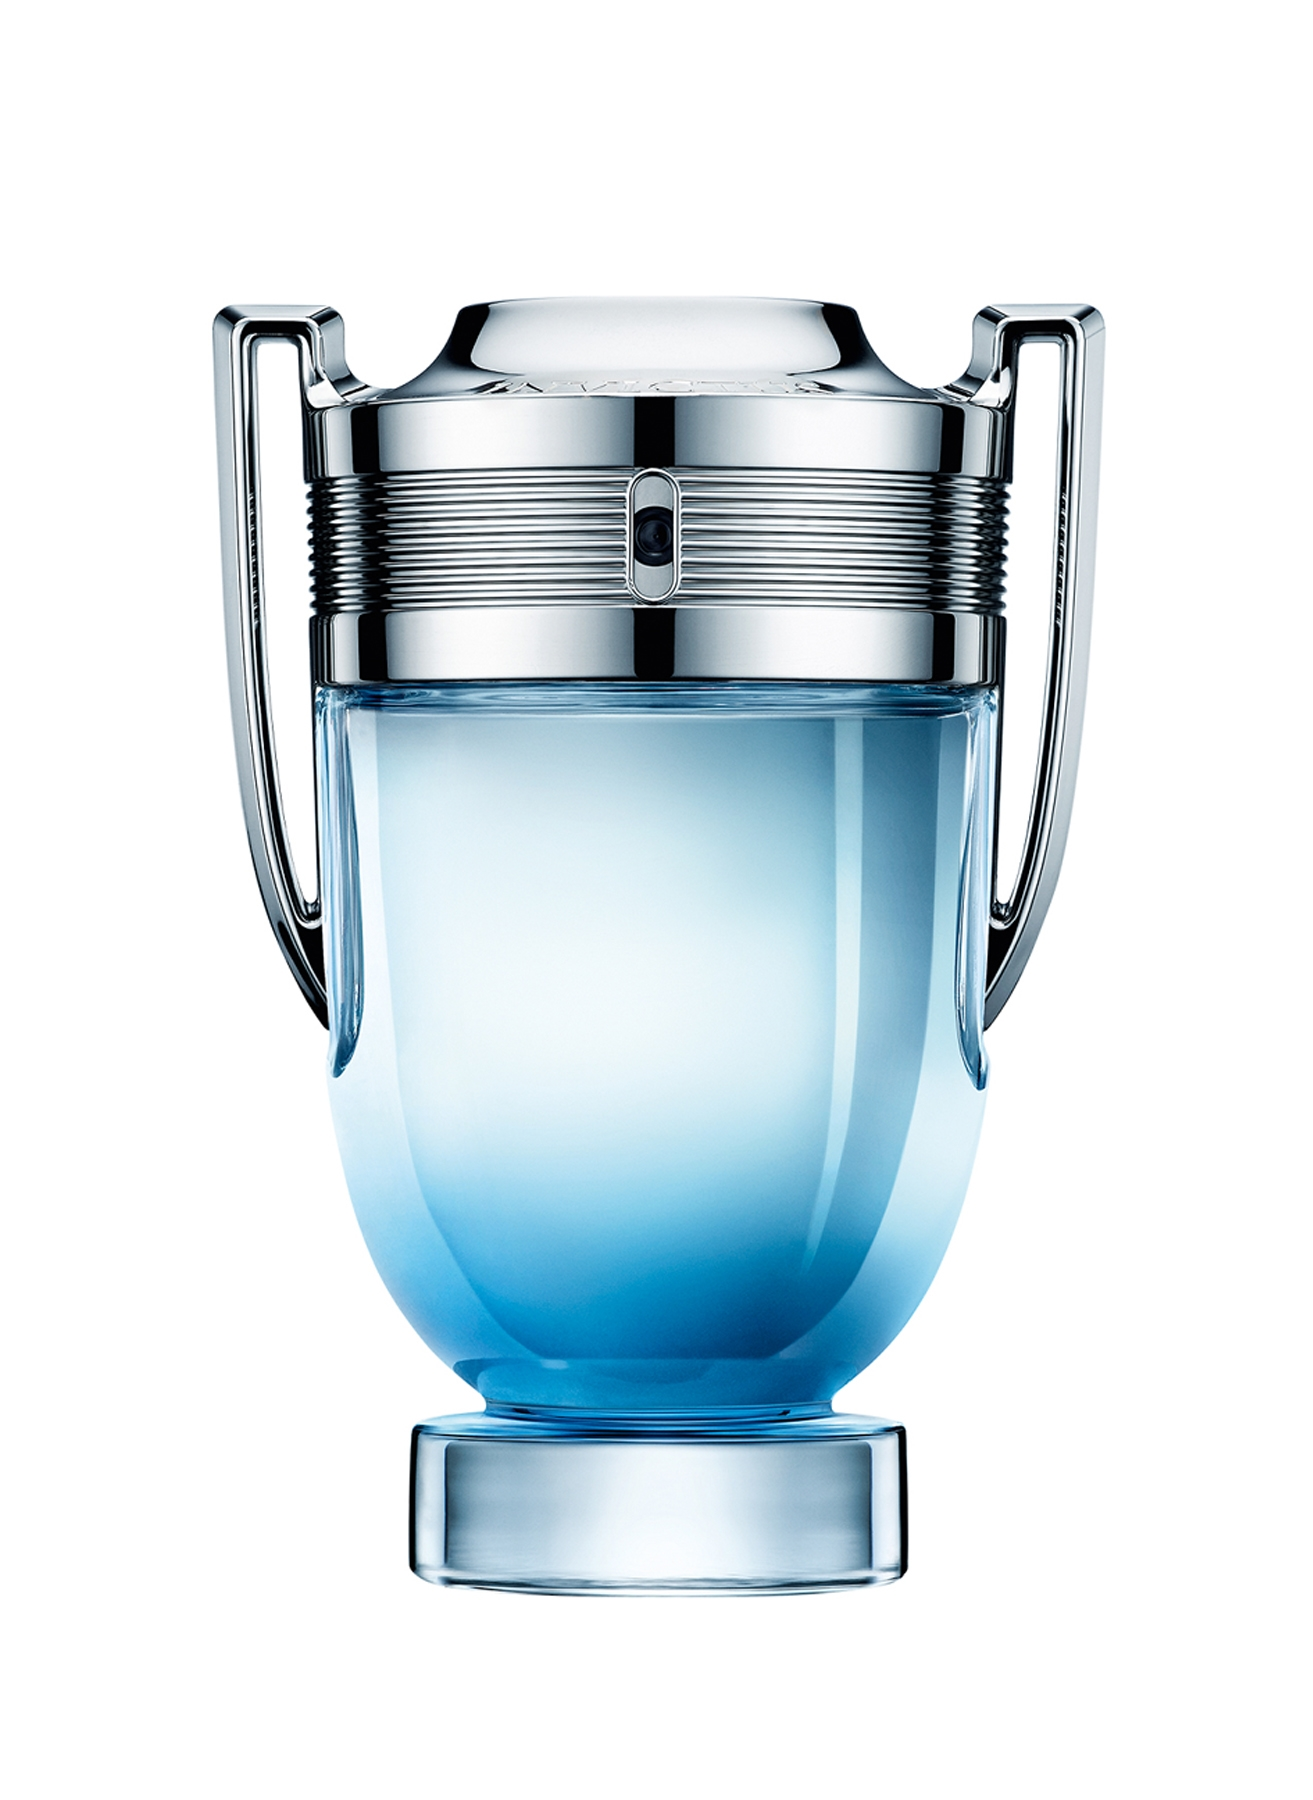 Paco Rabanne Invictus Aqua 50 ml EDT